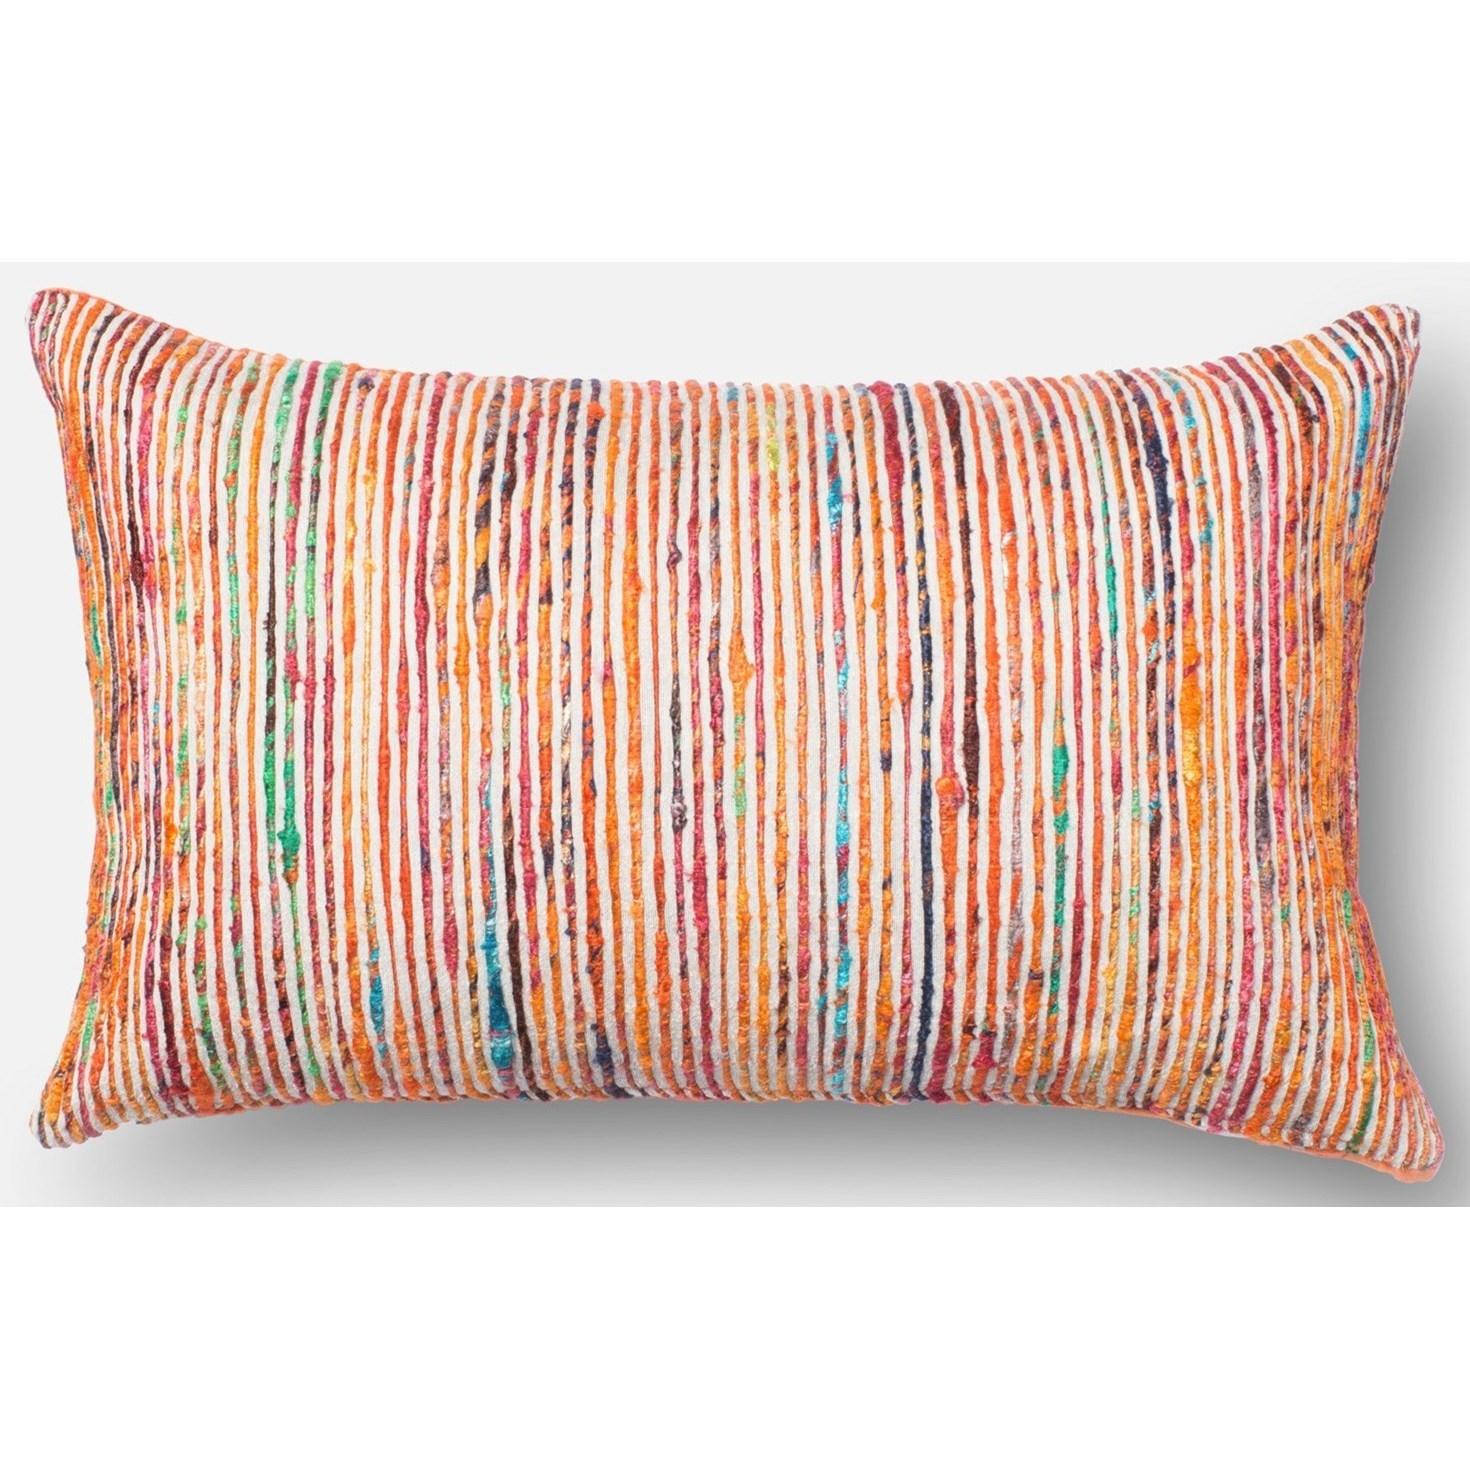 "Dhurri Style 13"" X 21"" Down Pillow by Loloi Rugs at Sprintz Furniture"